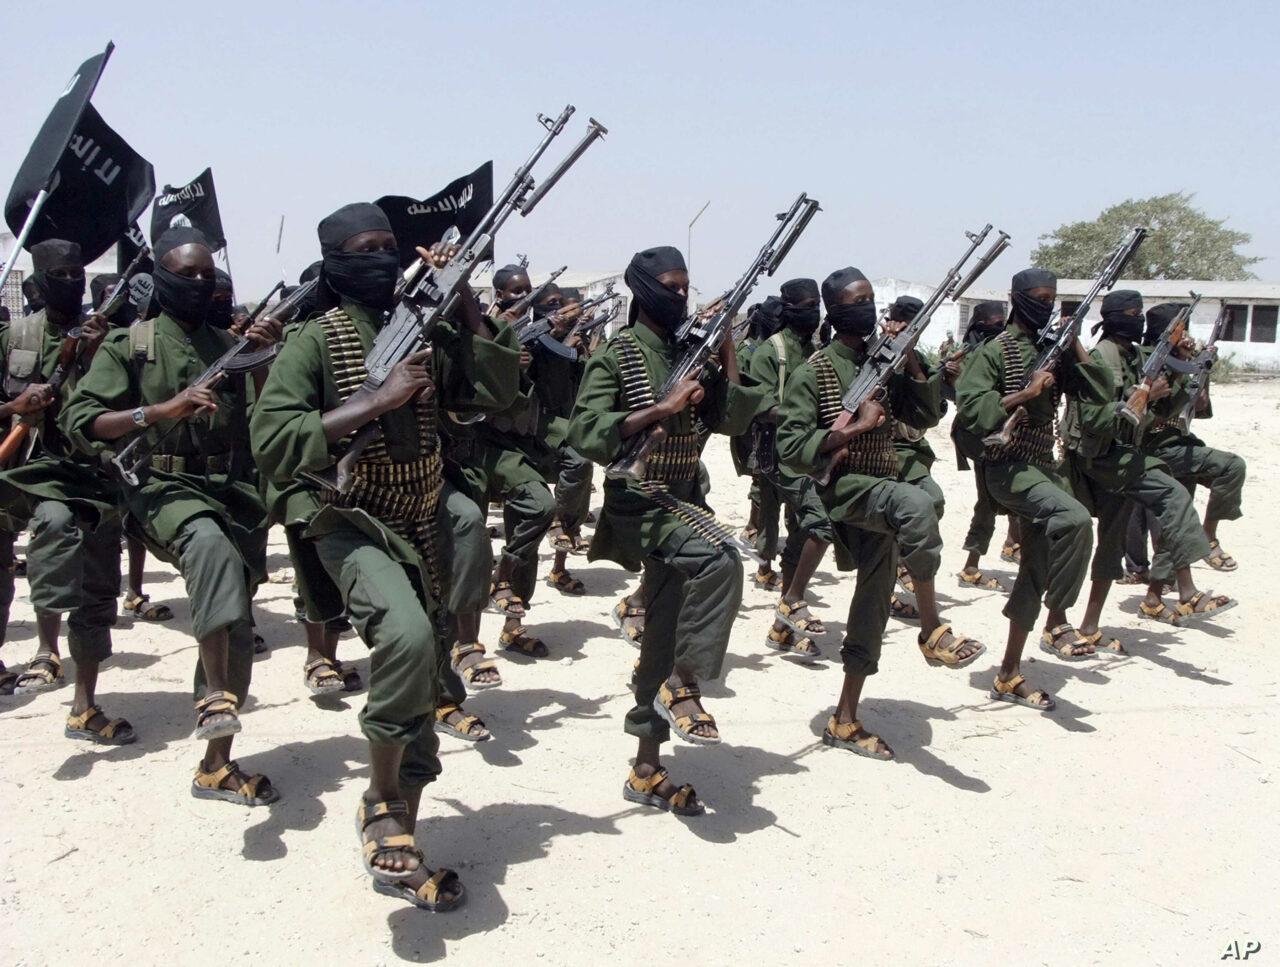 Somalia Stoned to Death